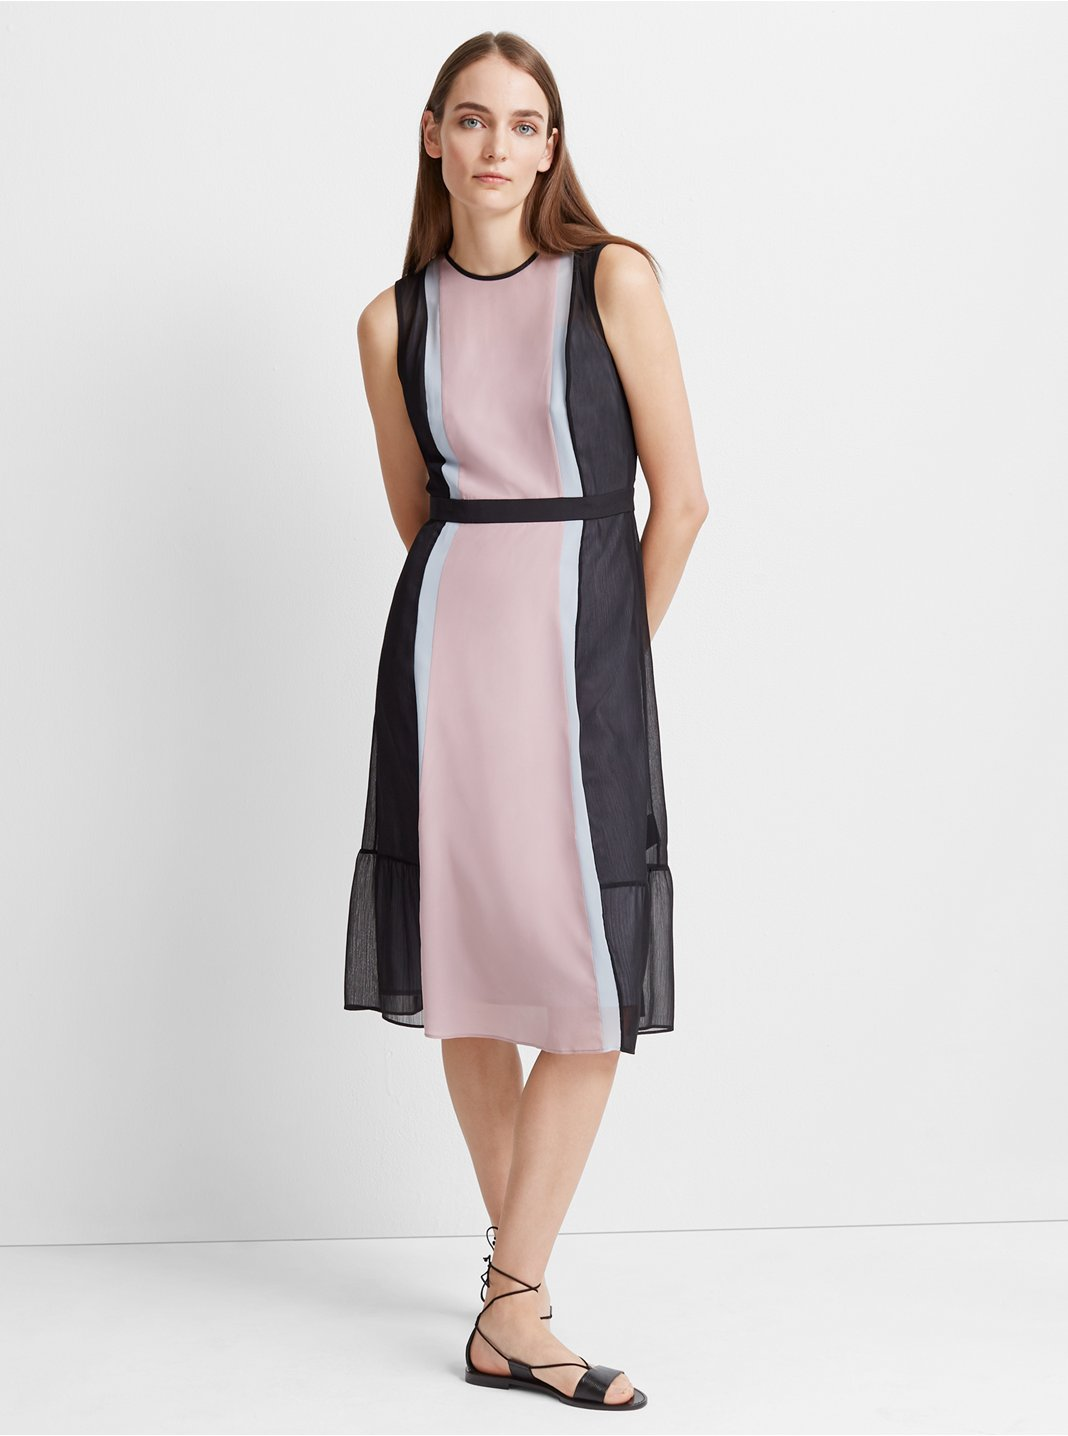 Nailuh Silk Dress